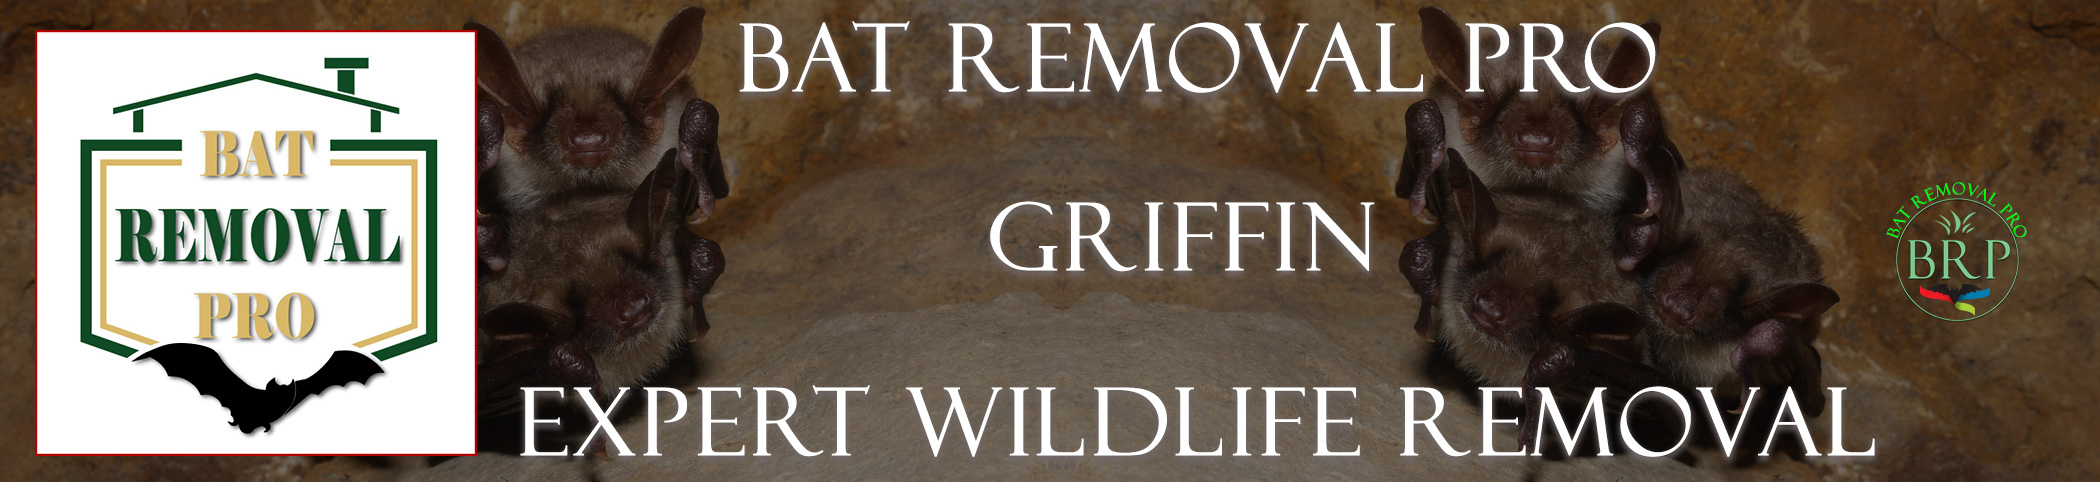 Griffin-bat-removal-at-bat-removal-pro-header-image